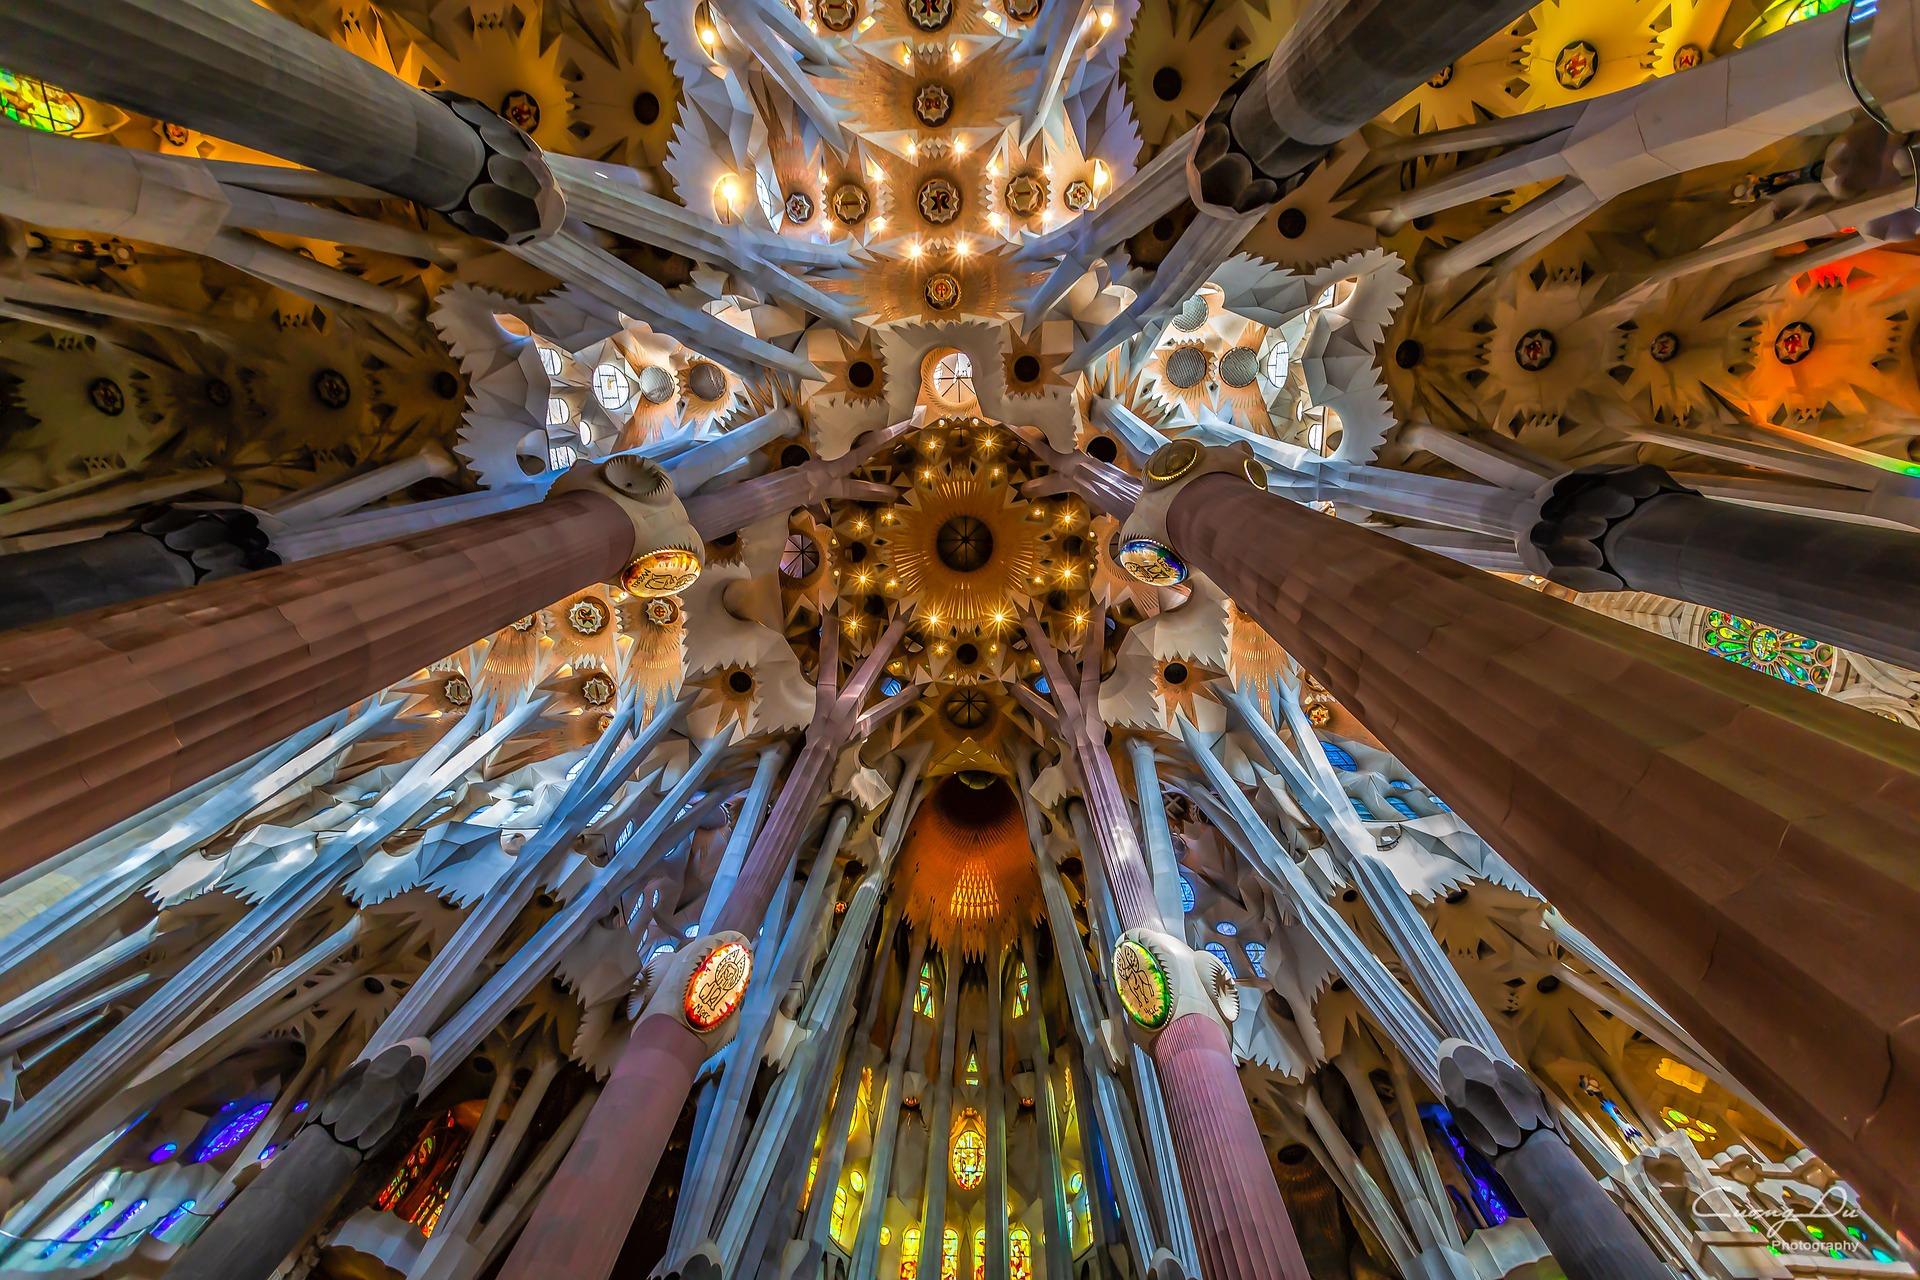 The ceiling of La Sagrada Familia (photo: CD_Photosaddict, Pixabay)